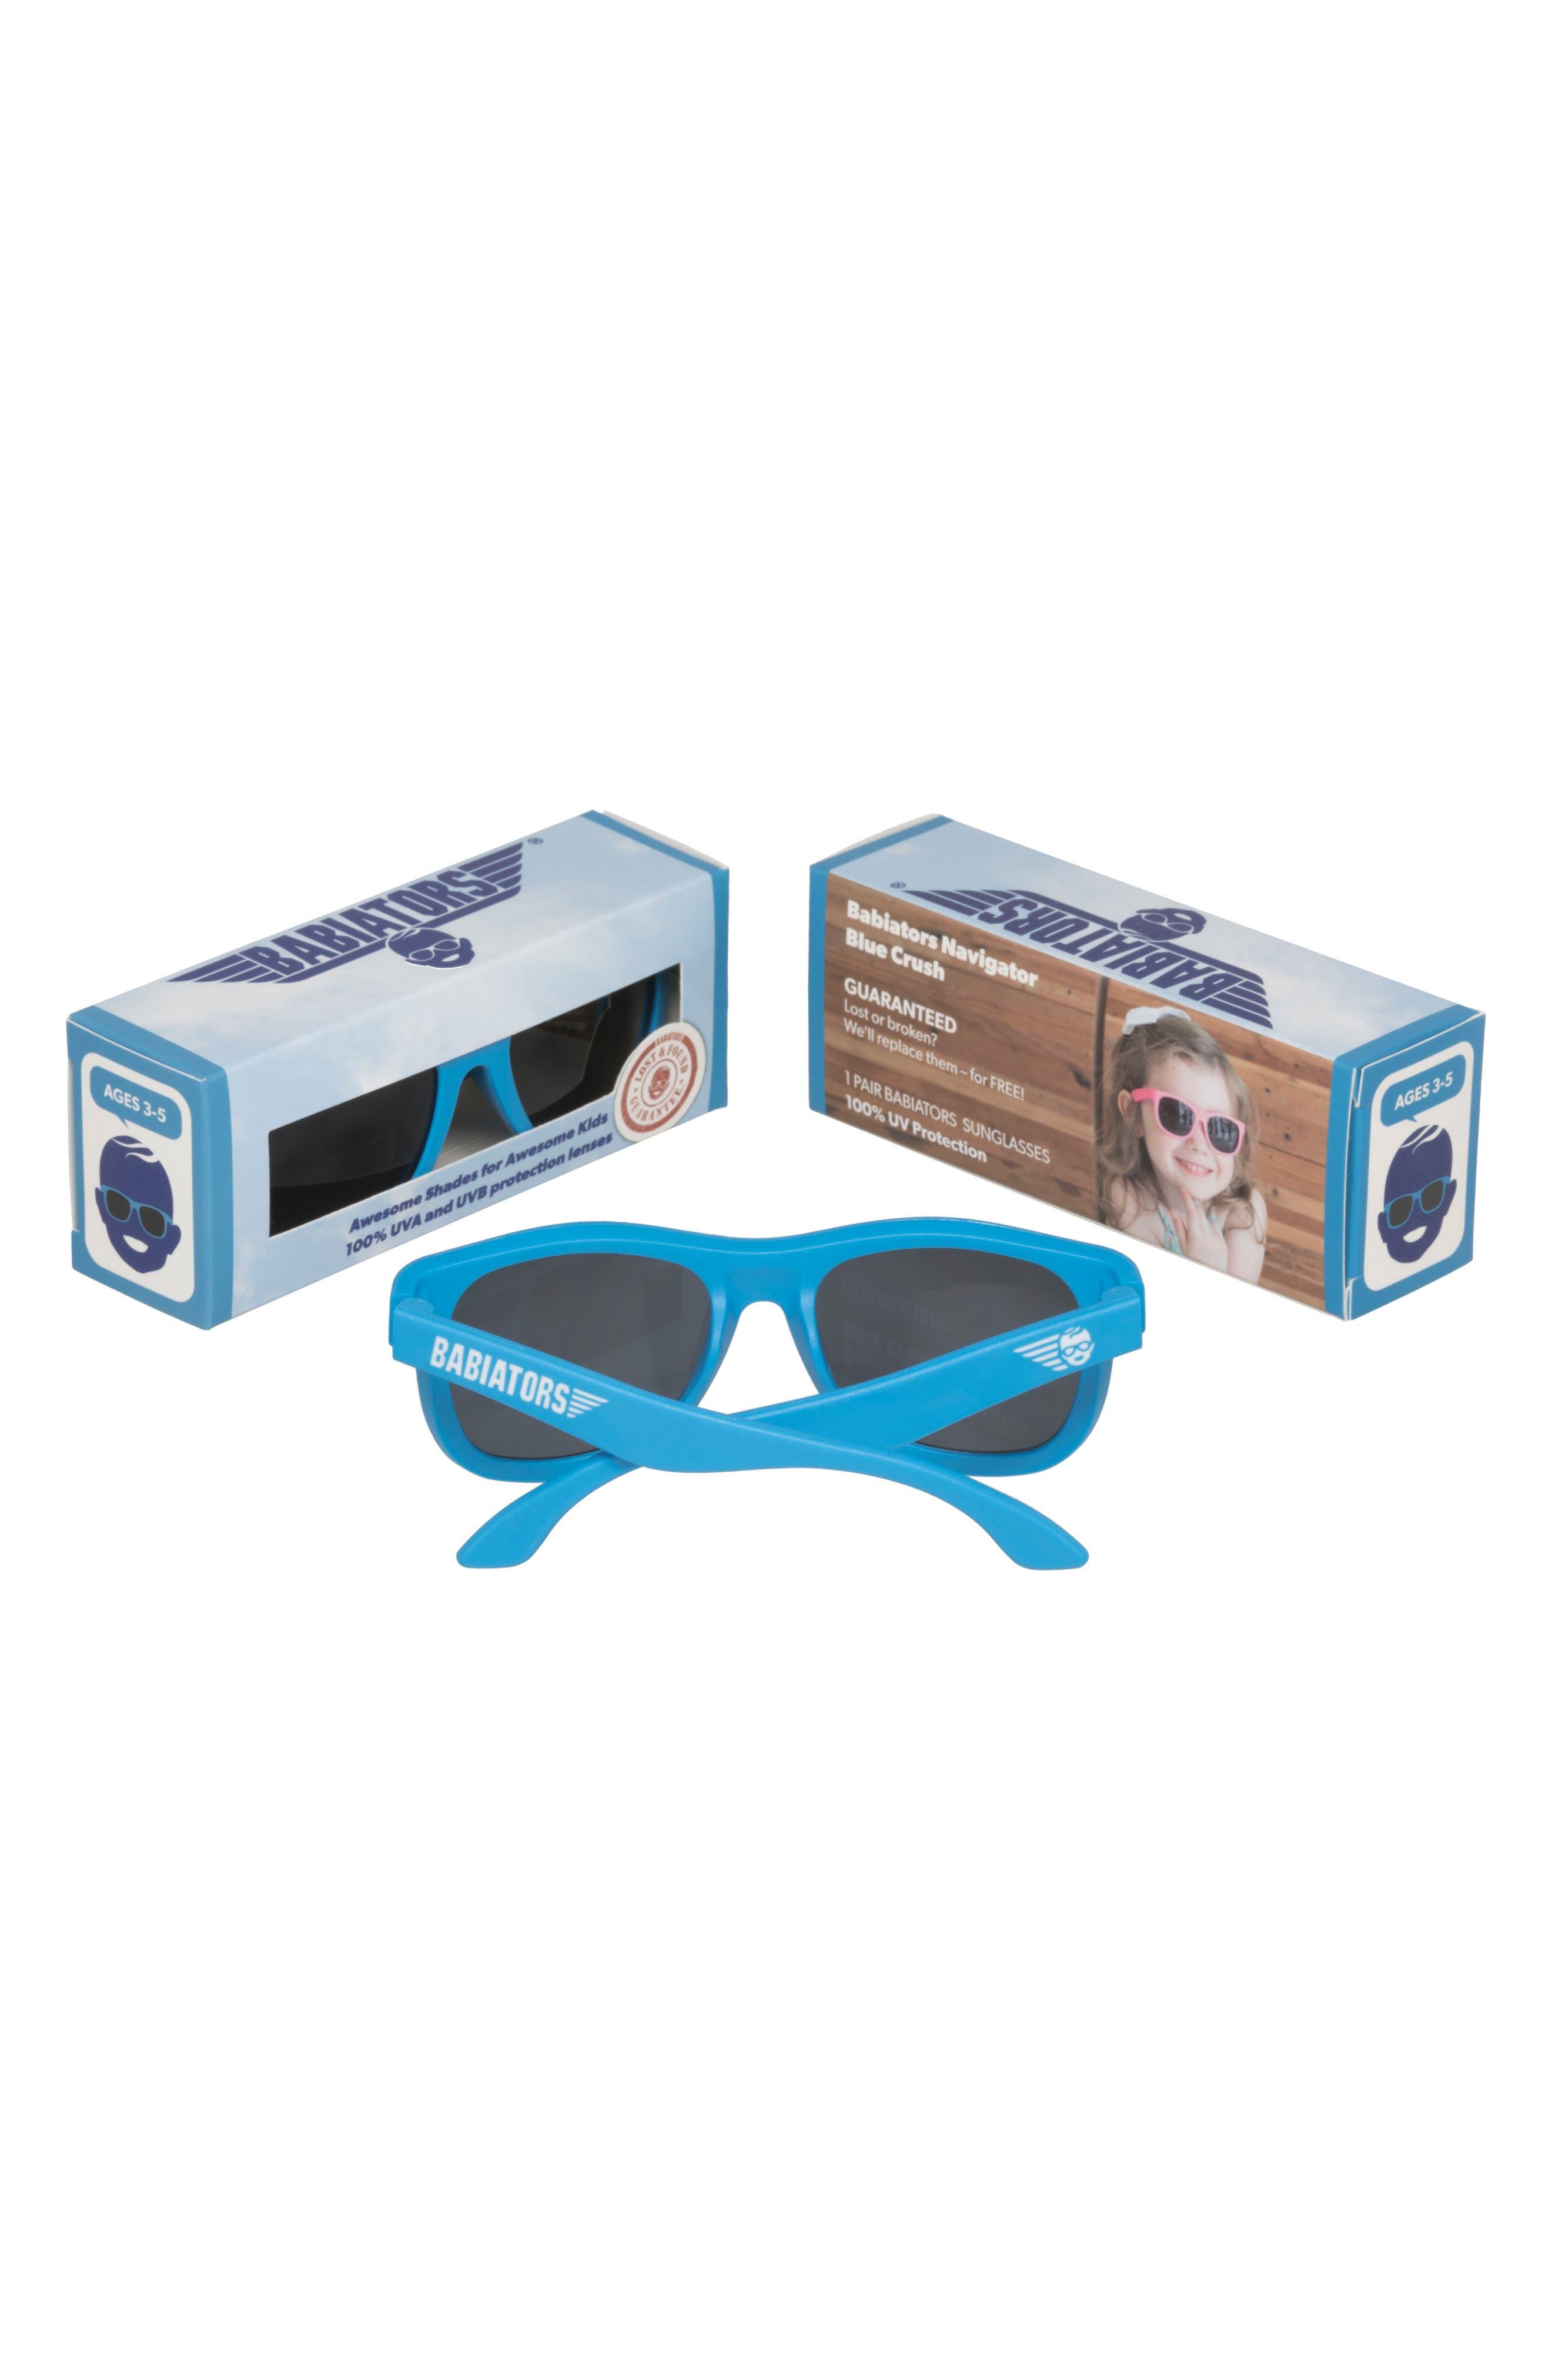 Original Navigators Sunglasses,                             Alternate thumbnail 2, color,                             Blue Crush